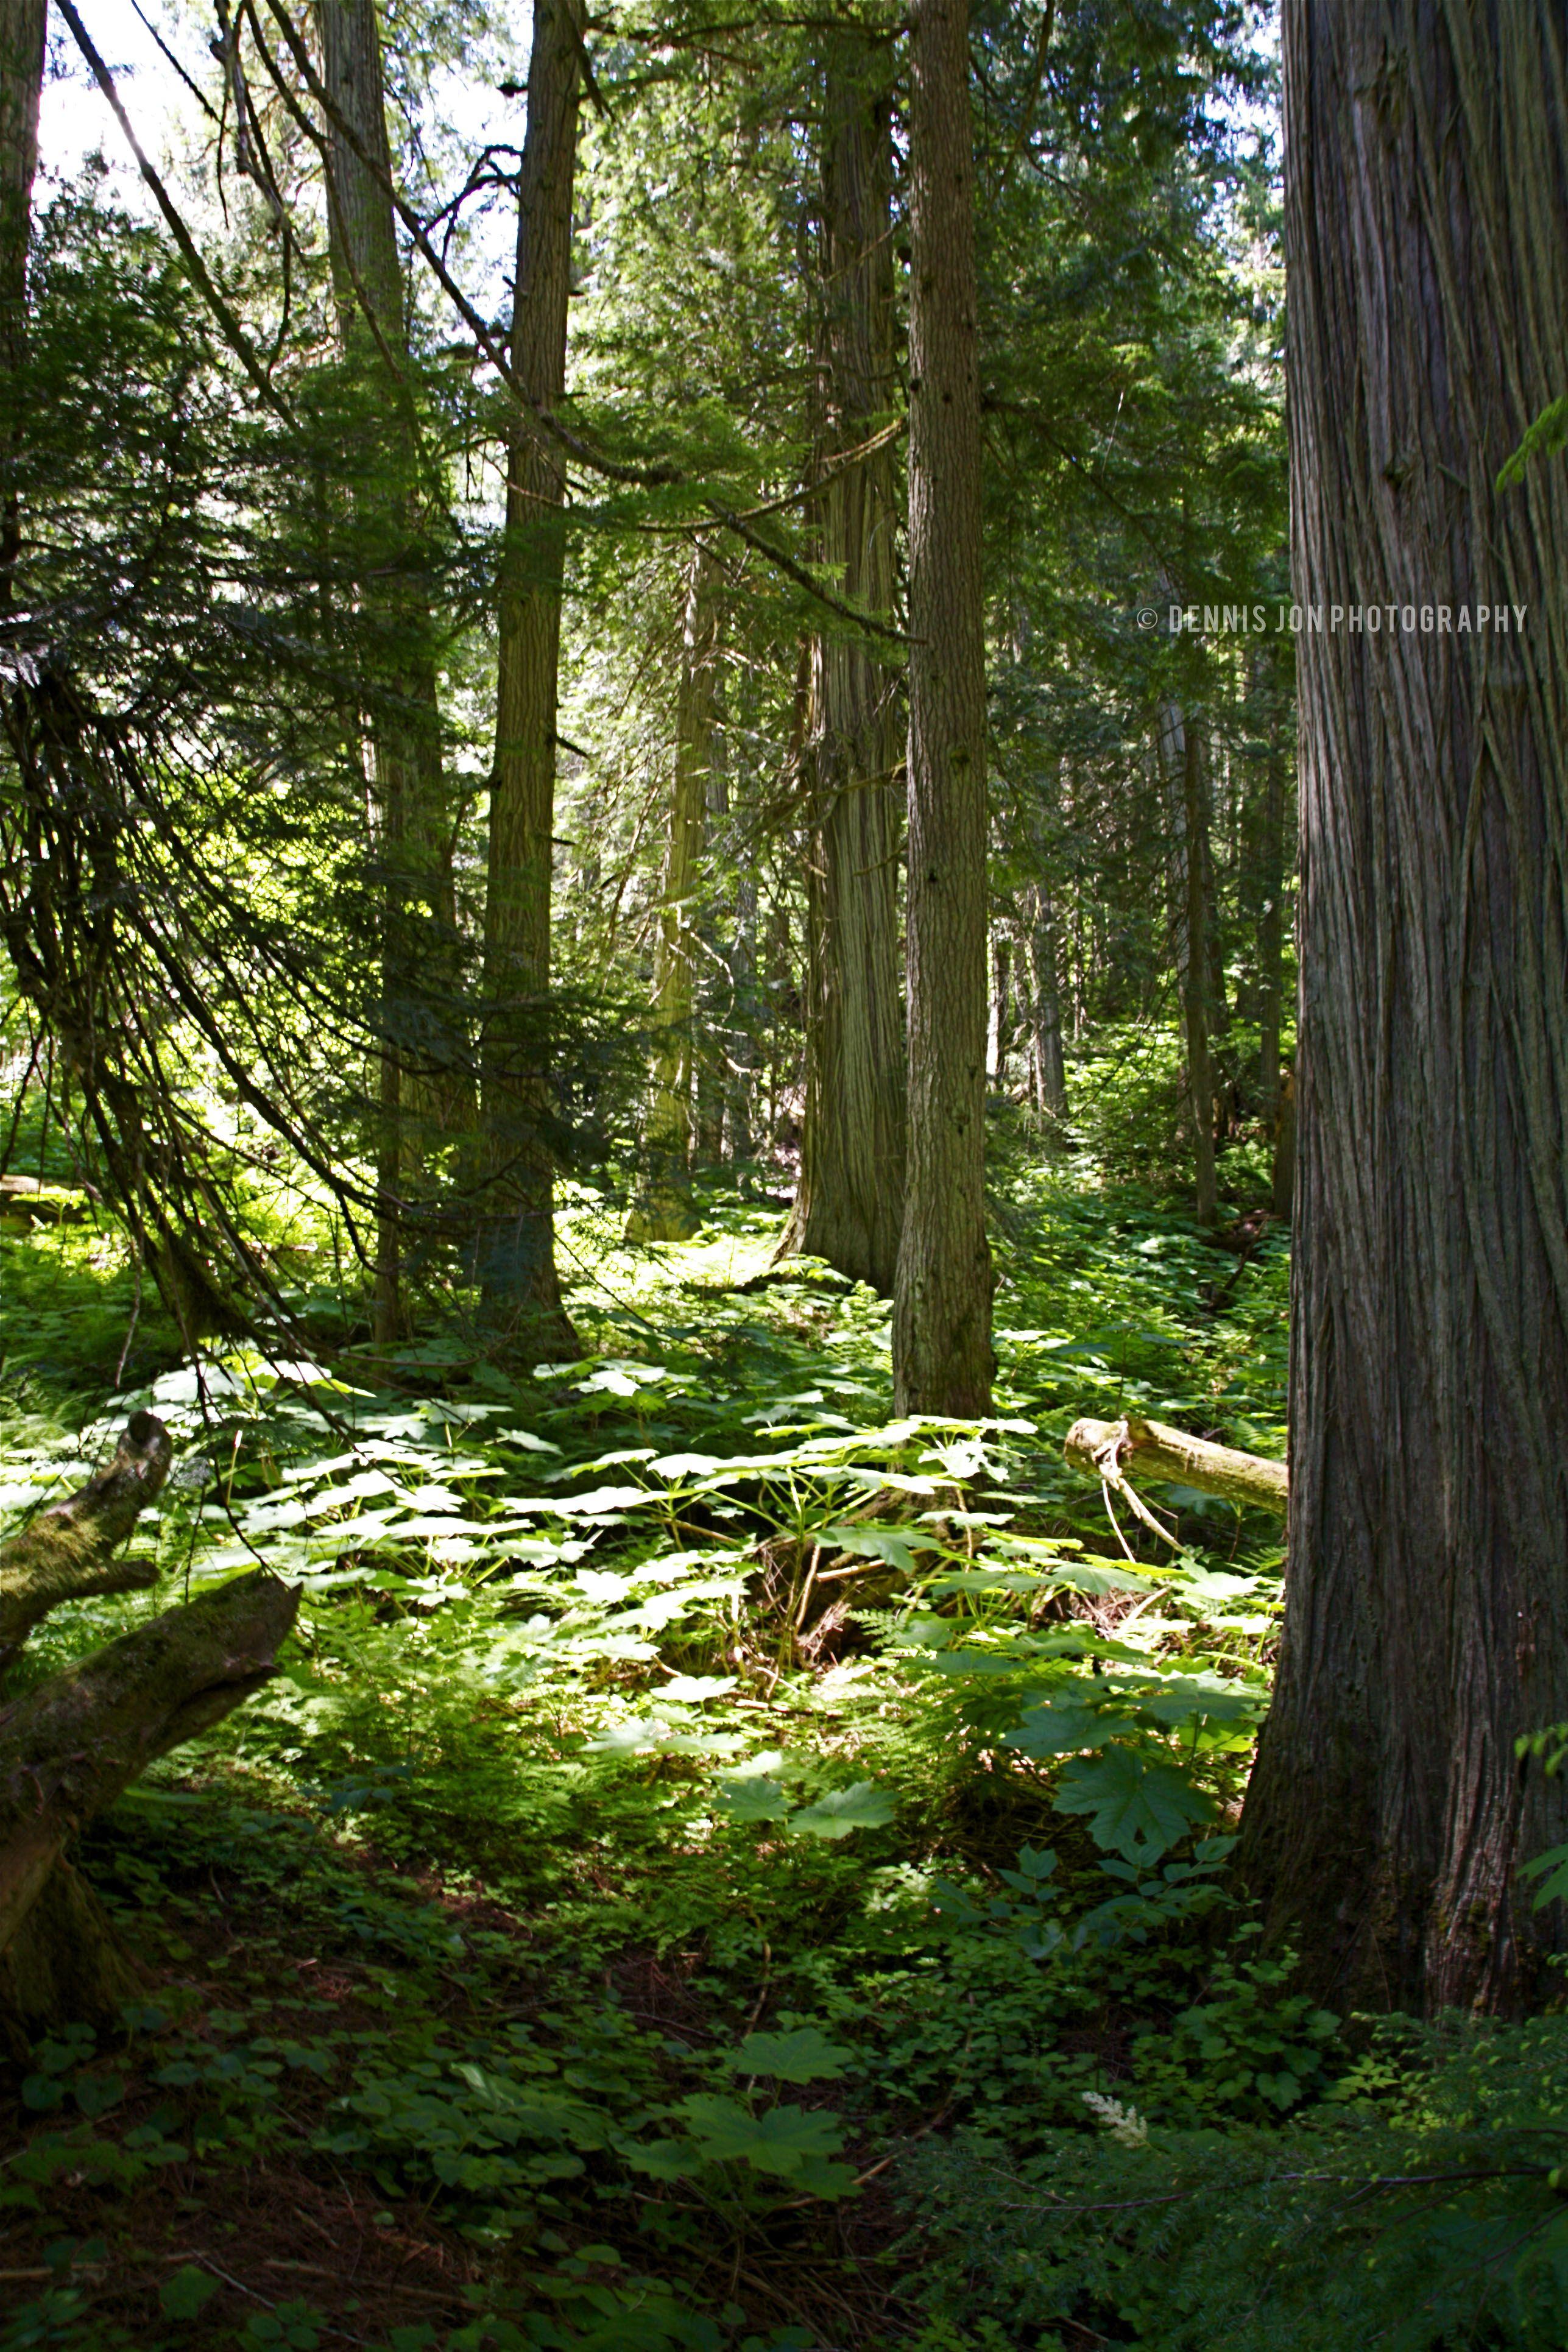 """Cedar Forest"" British Columbia,Canada visit dennisjonphotography taken by Dennis Kahl"